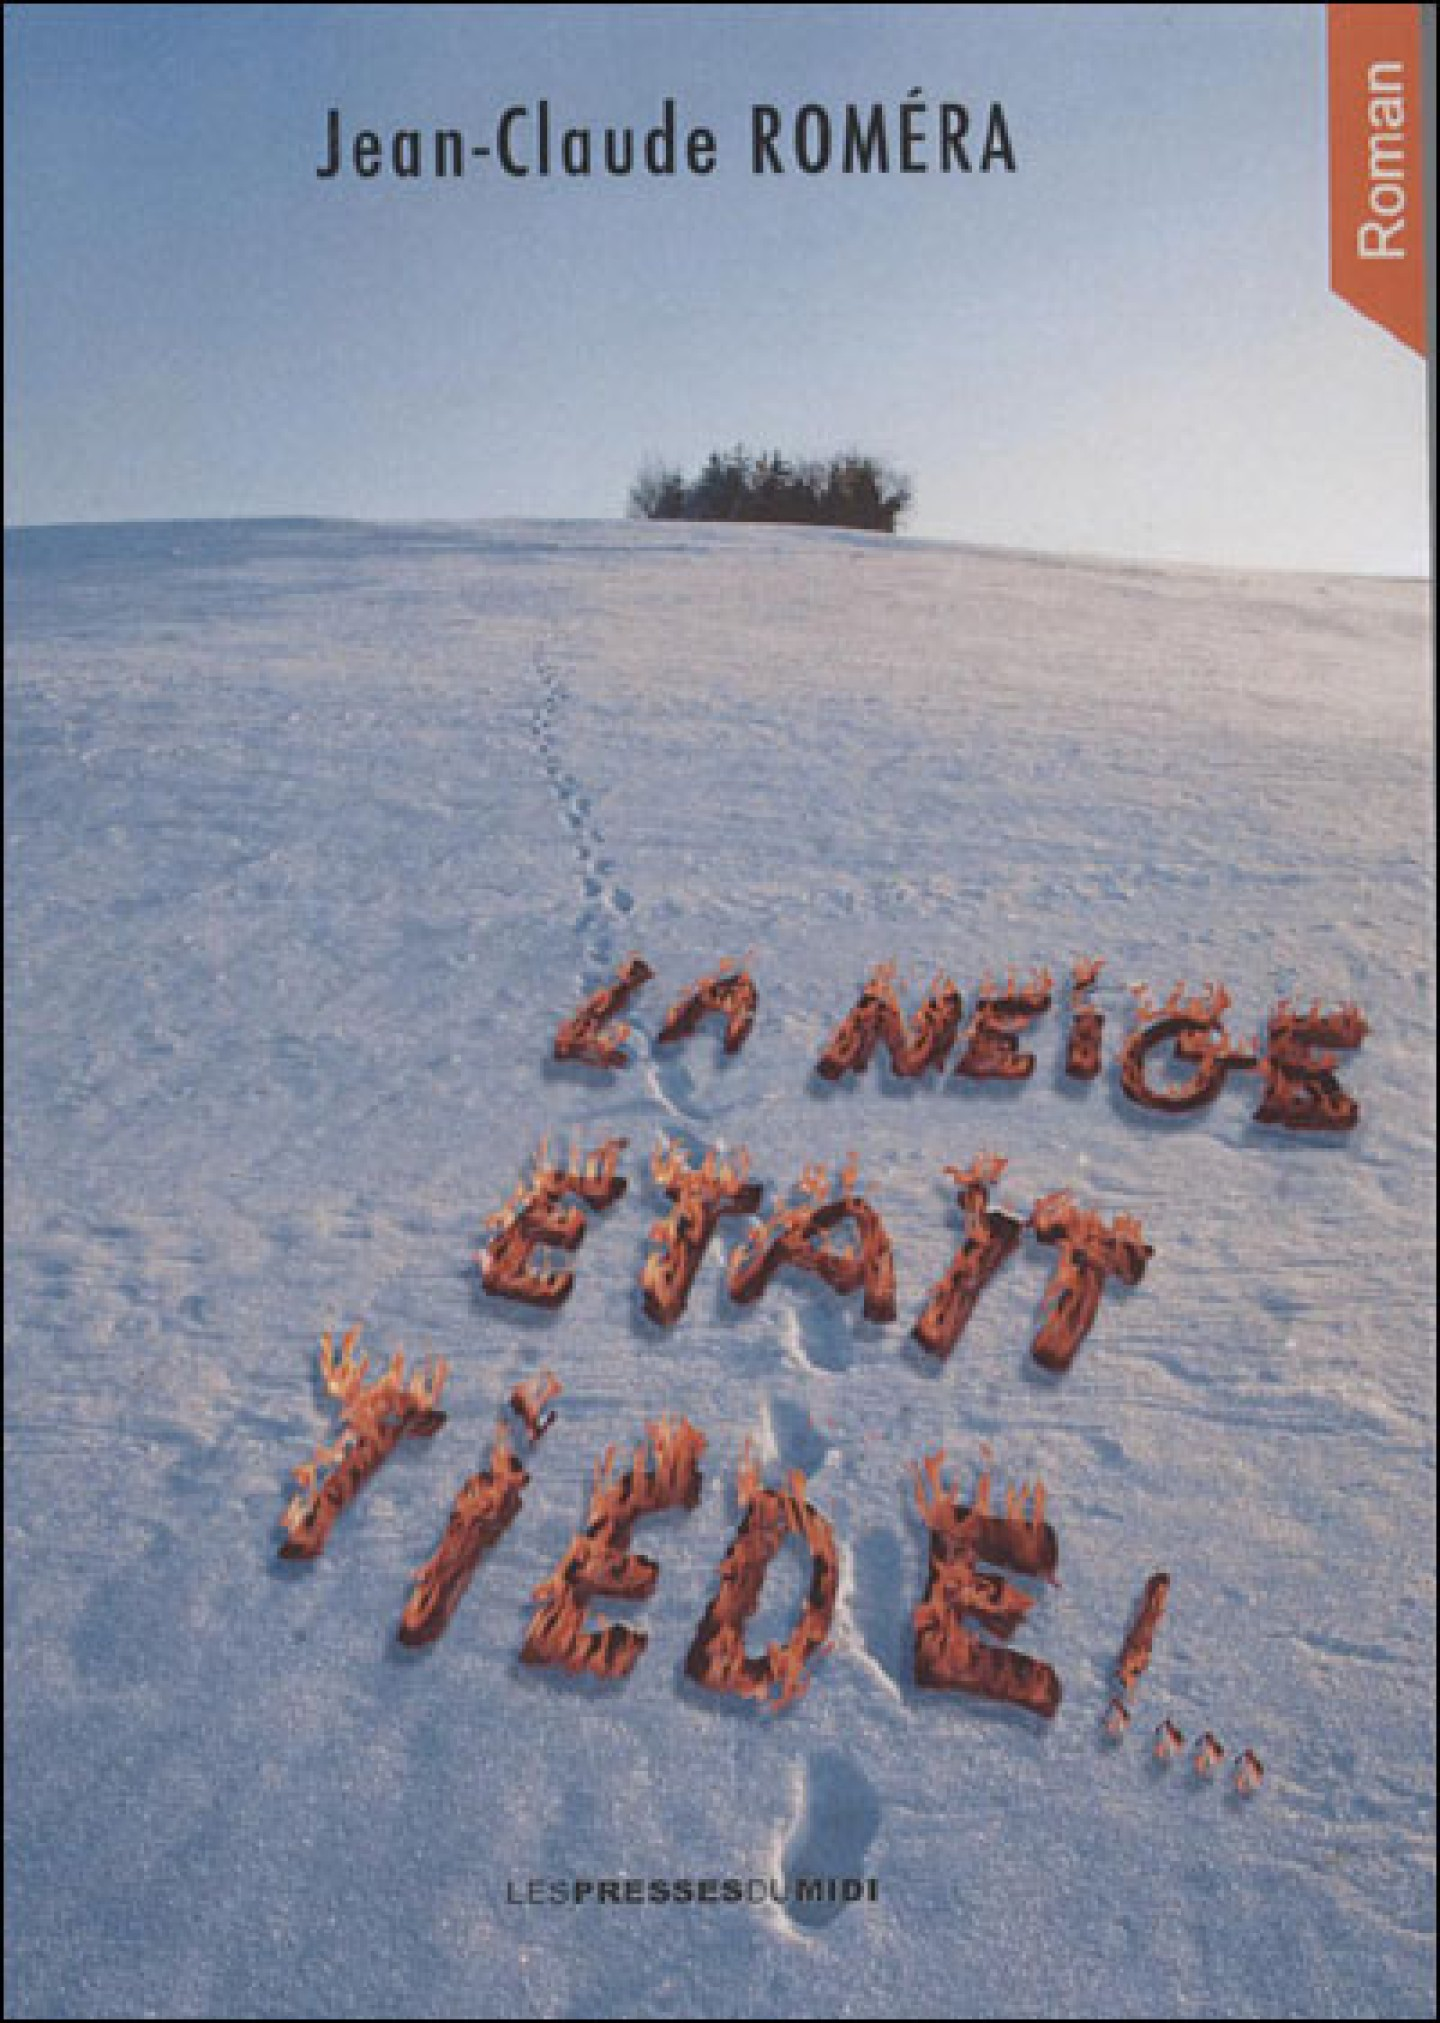 La neige était tiède de Jean-Claude Romera